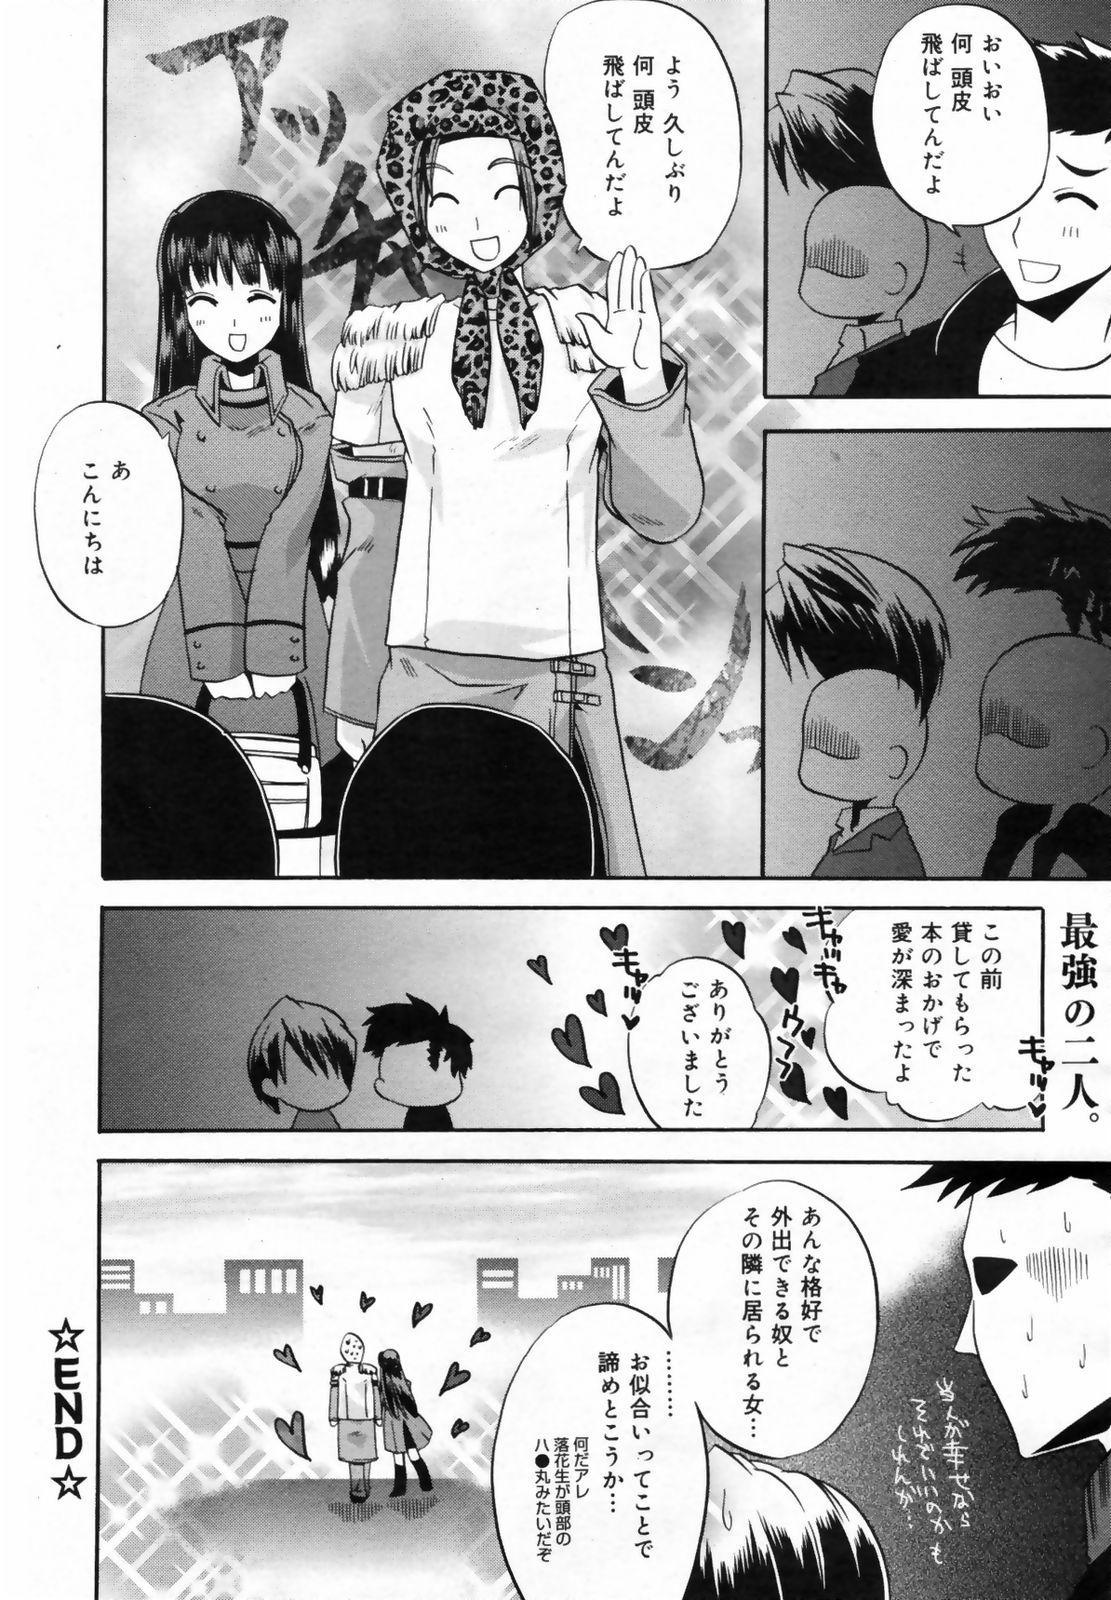 Manga Bangaichi 2009-02 Vol. 234 57